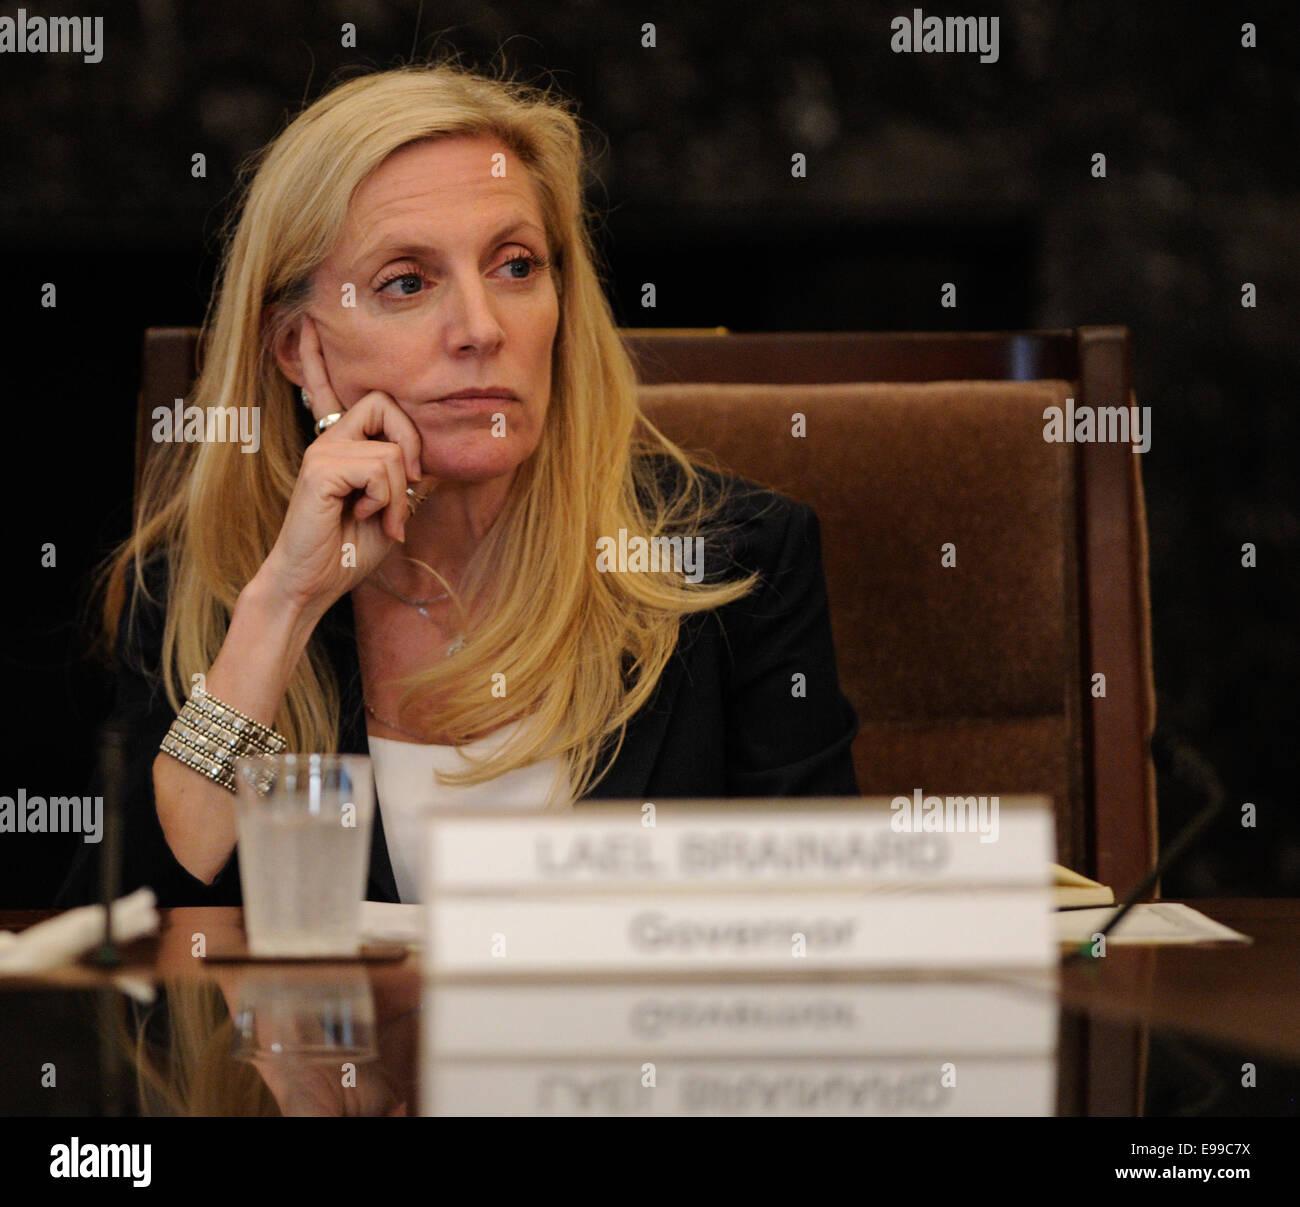 Washington, DC, USA. 22nd Oct, 2014. U.S. Under Secretary of Treasury Lael Brainard attends an open meeting at the Stock Photo